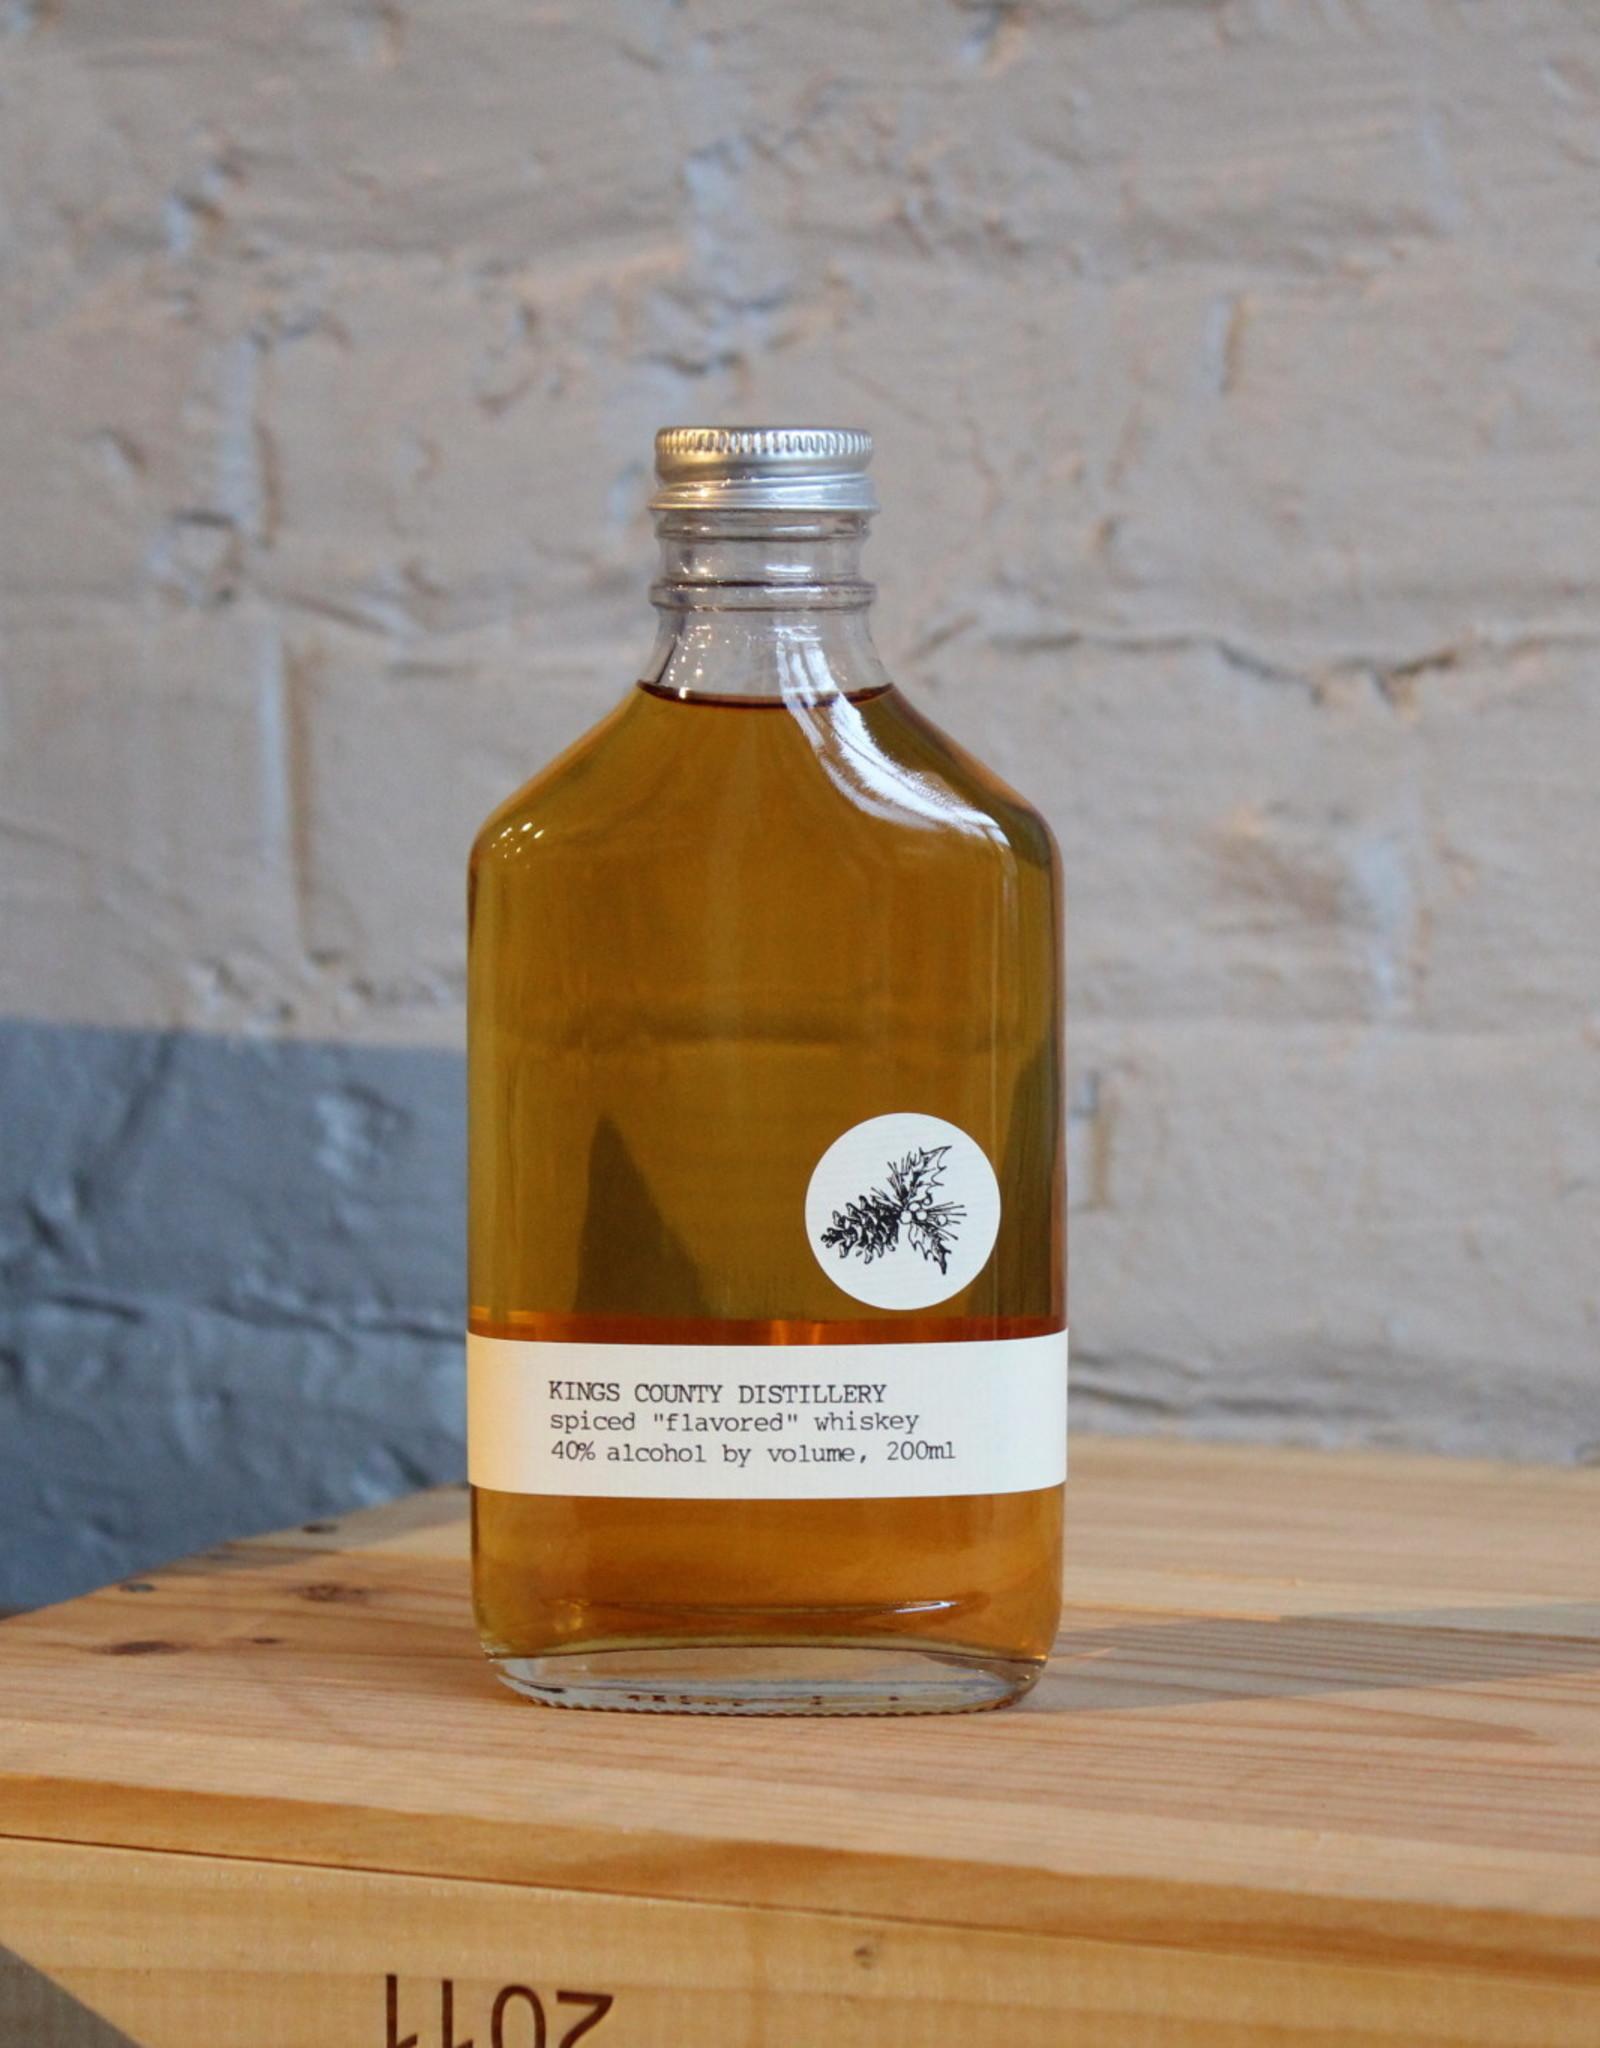 Kings County Distillery Spiced Whiskey - Brooklyn, NY (200ml)